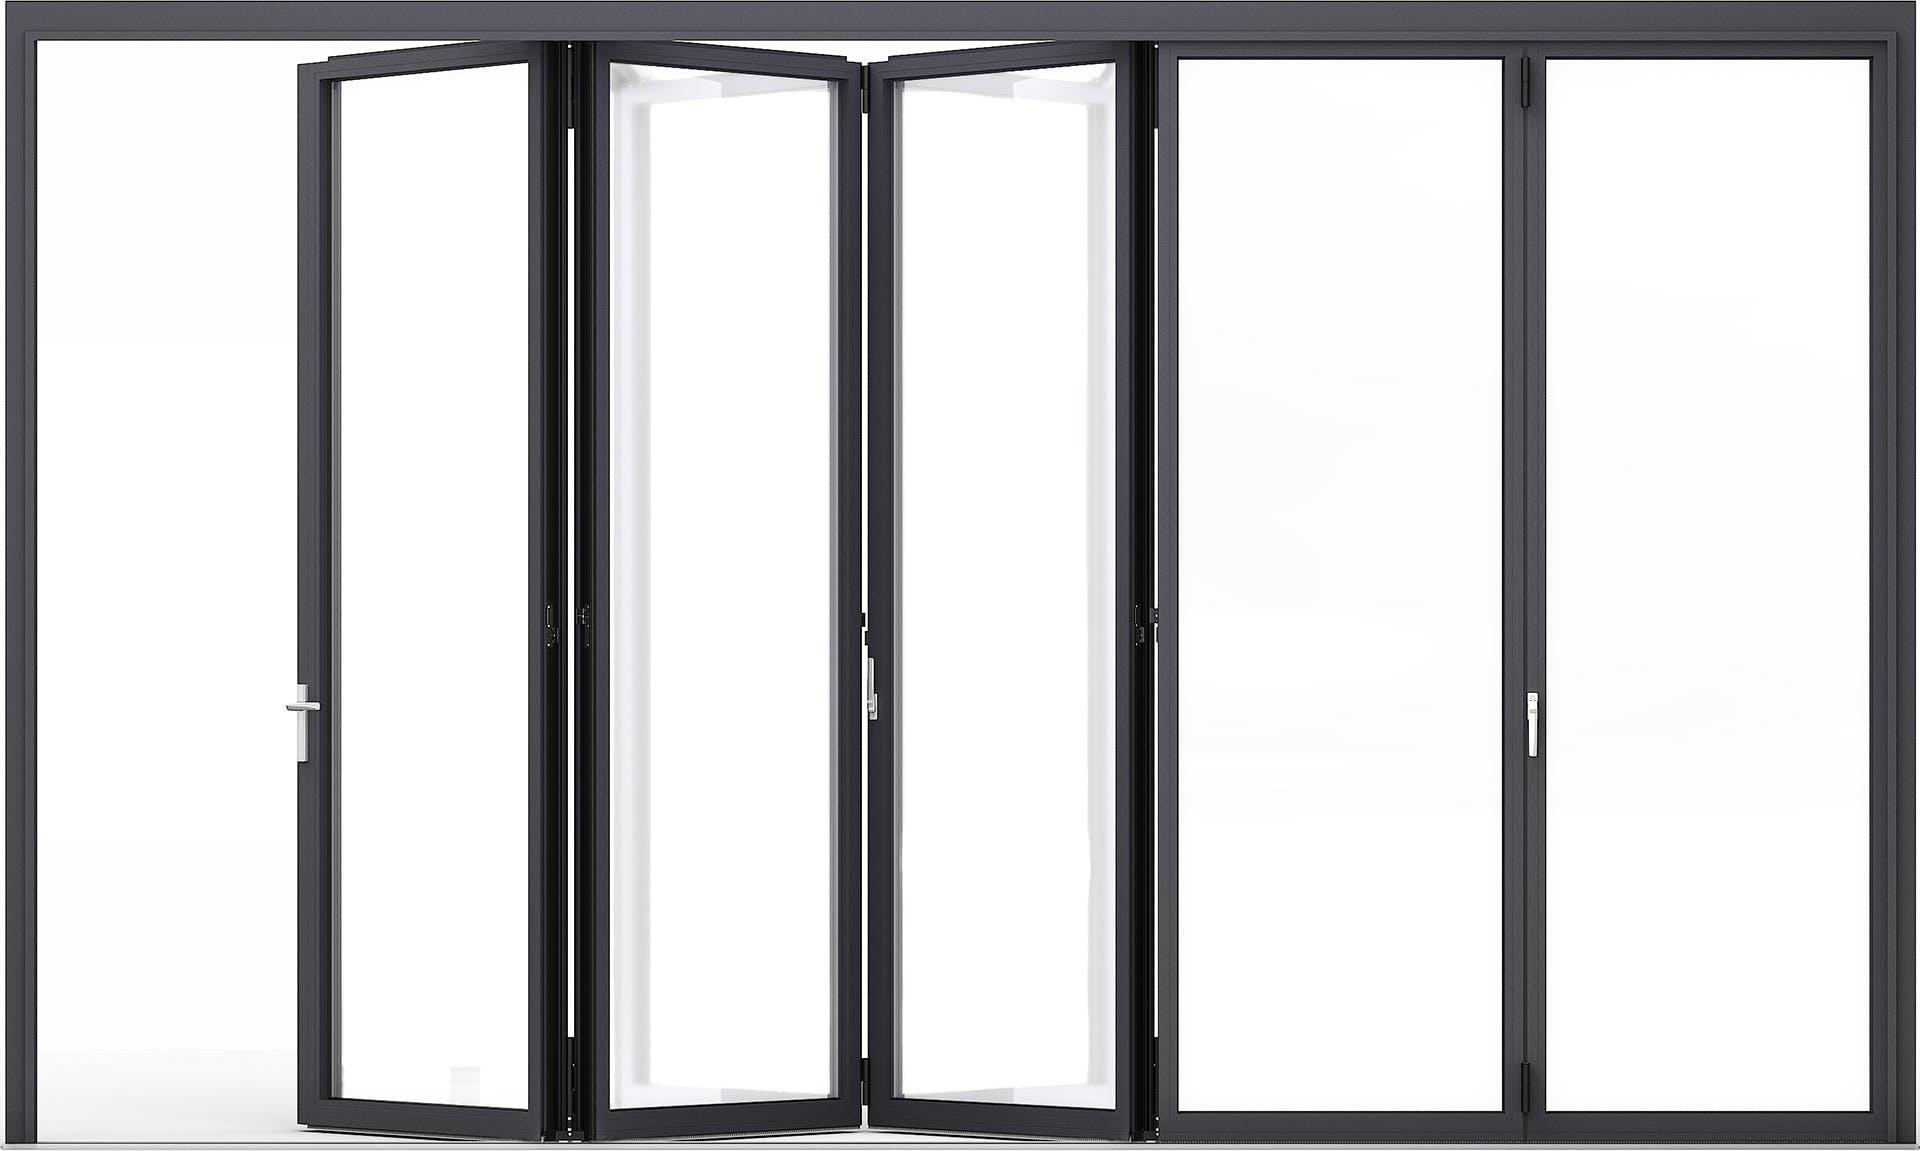 Generation 4 Folding Glass Walls by NanaWall